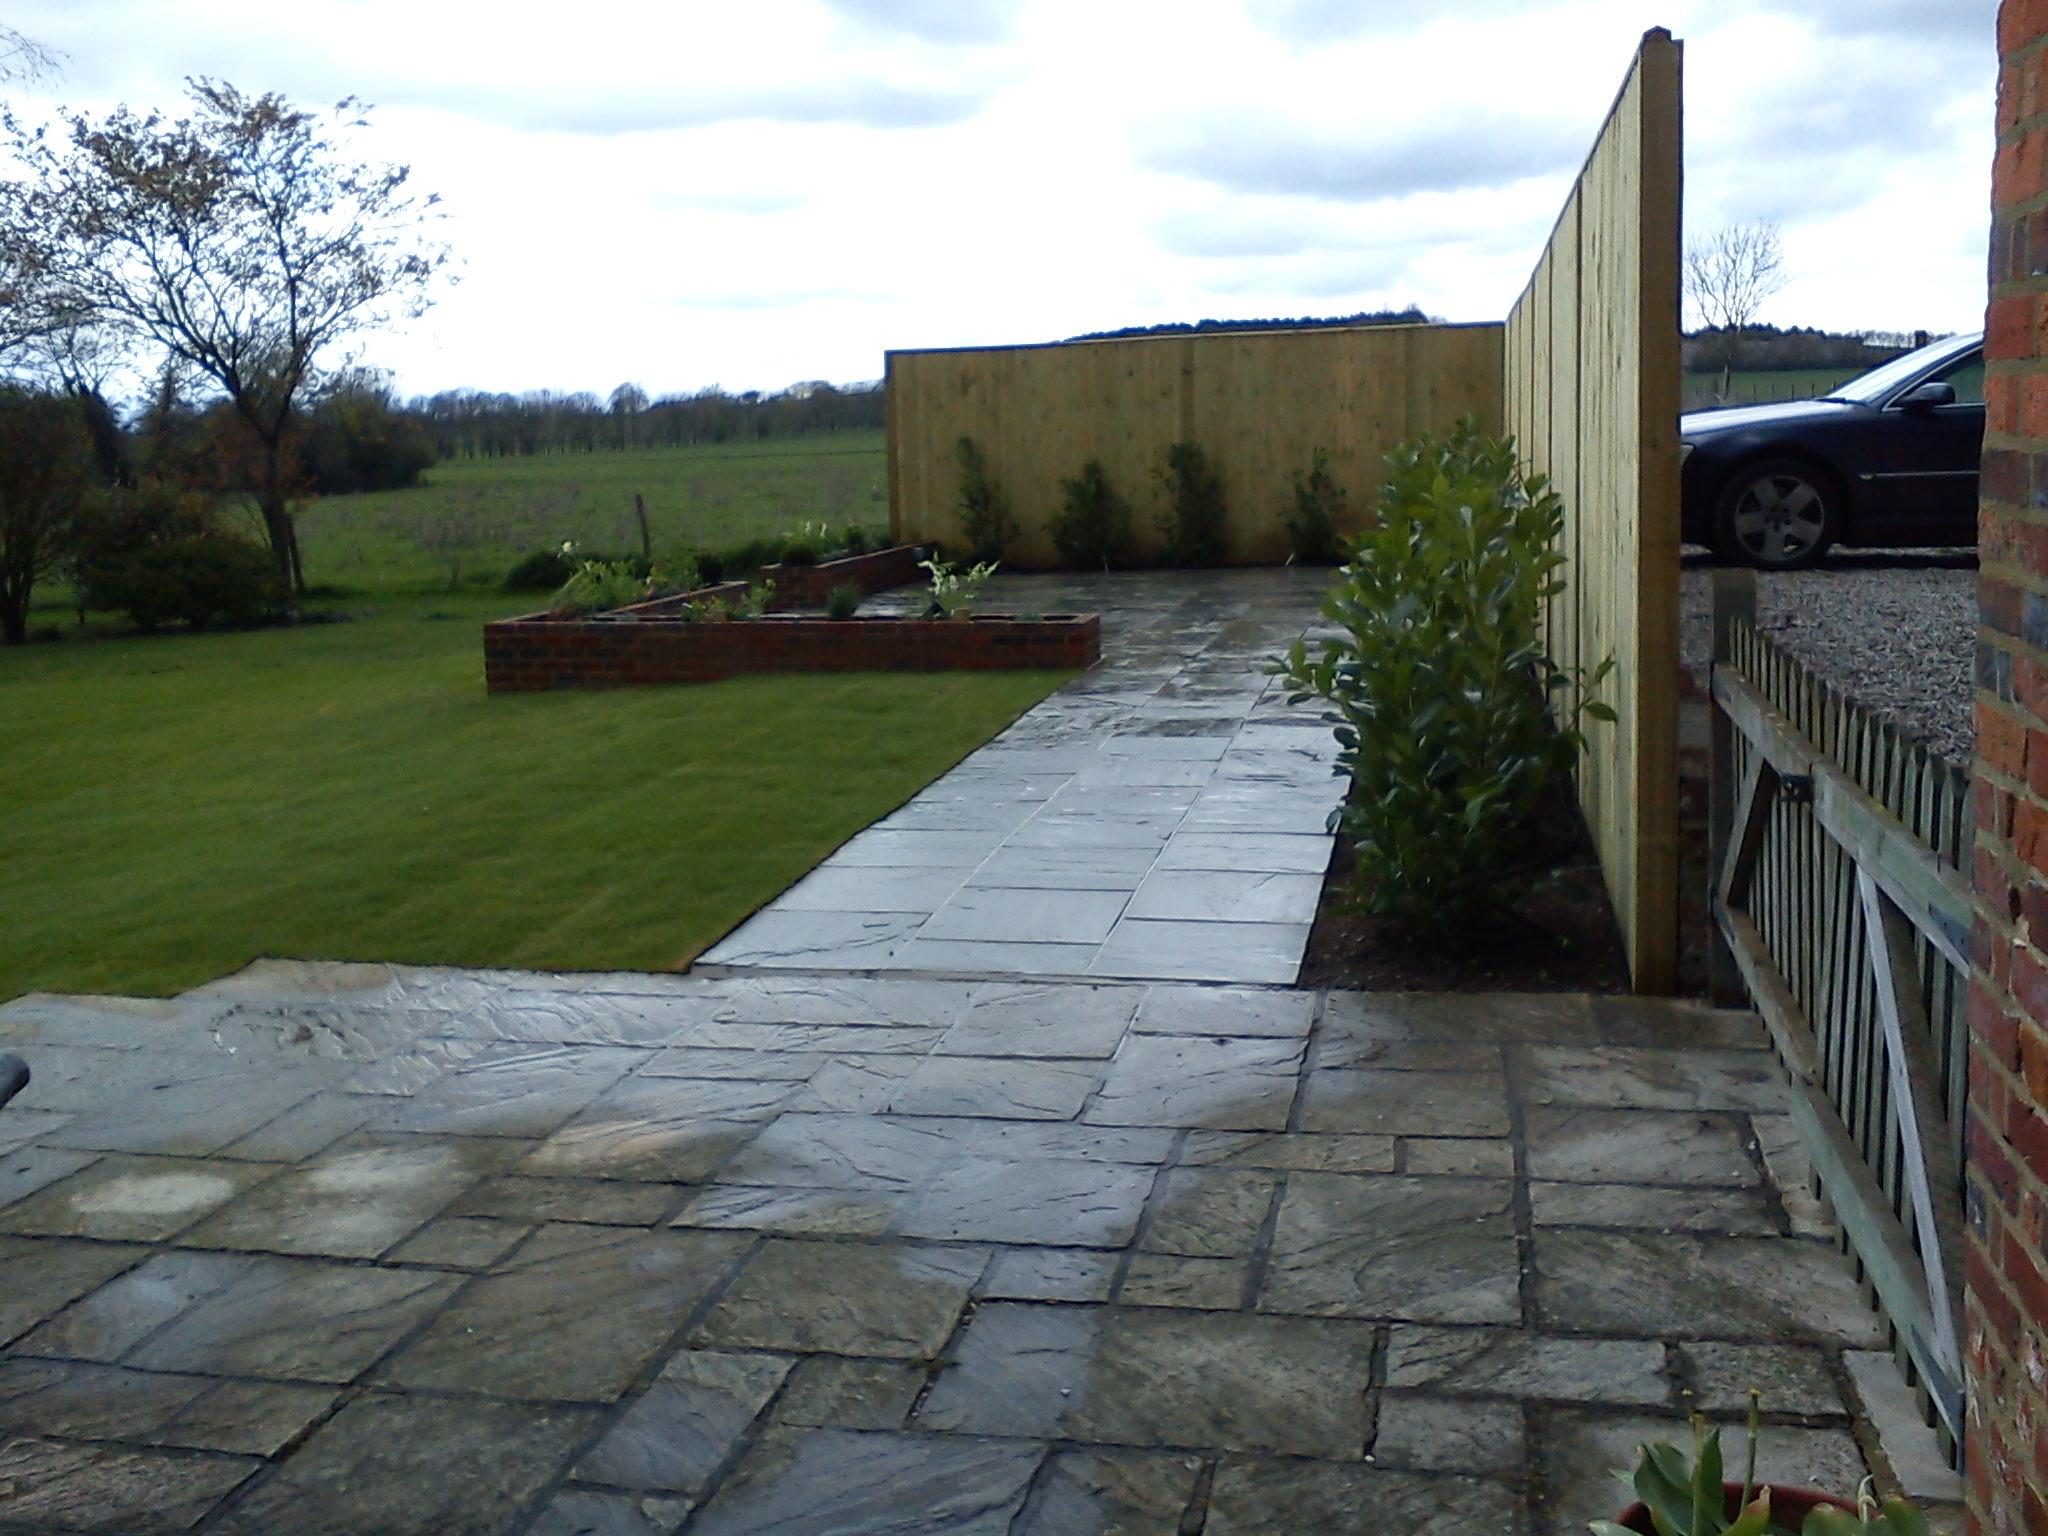 New Dawn Garden Life U2013 Garden Design And Landscaping In Oxfordshire